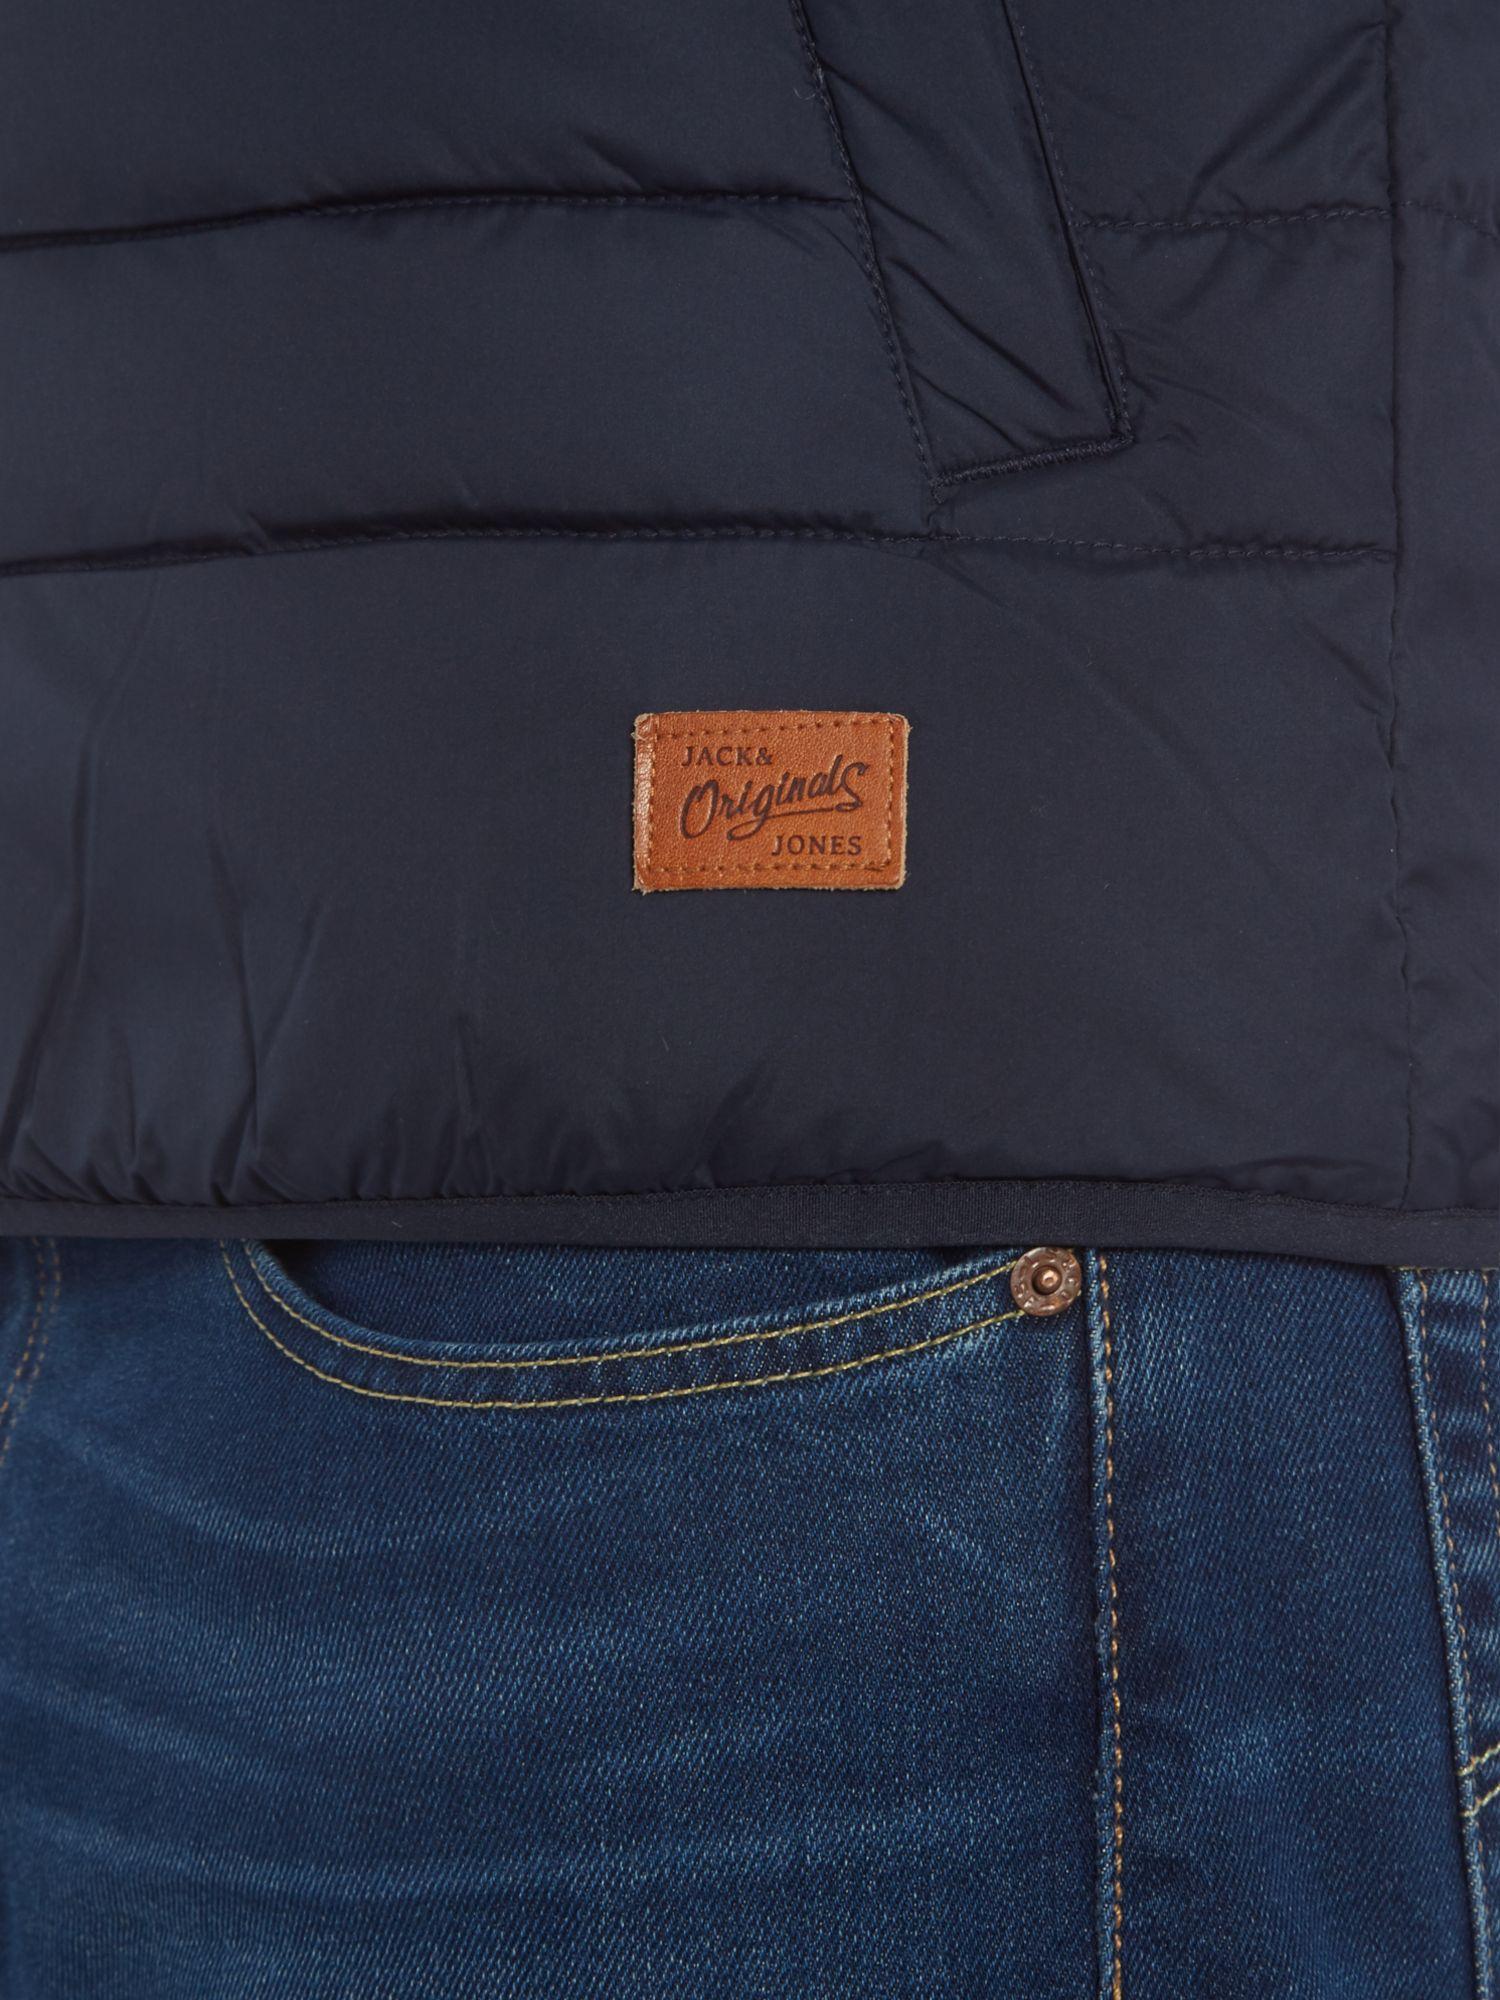 Jack & Jones Synthetic Hooded Padded Jacket in Blue for Men